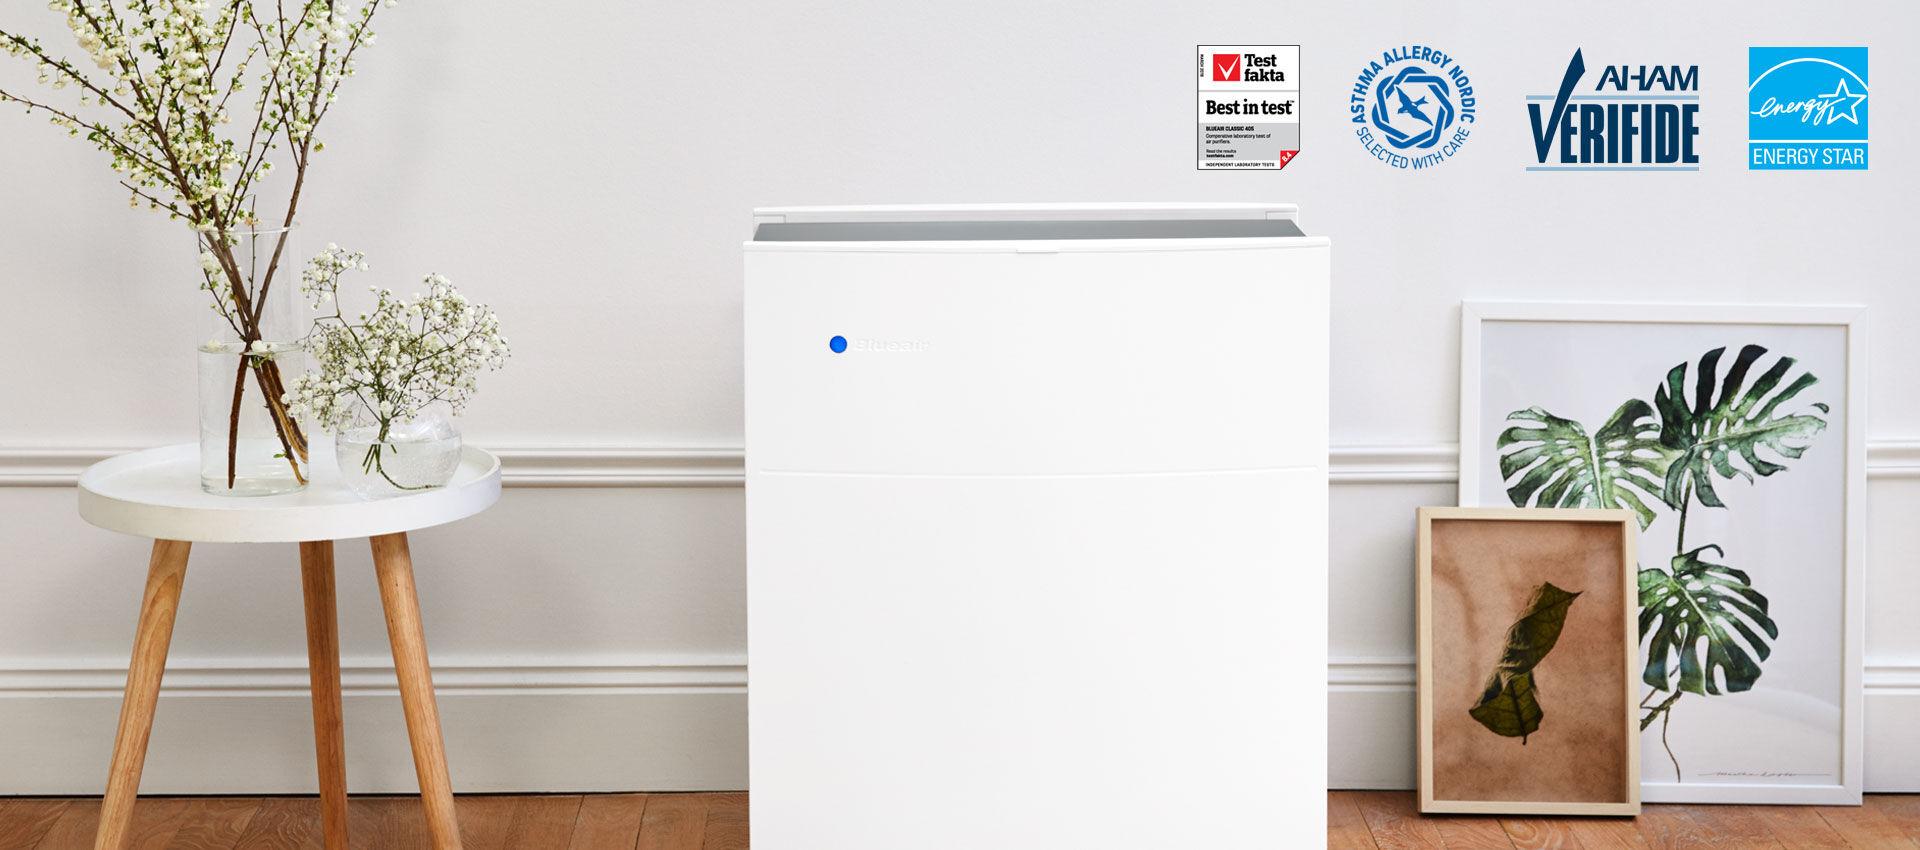 Blueair  Our most awarded air purifier  EU-classic-405-awards-banner